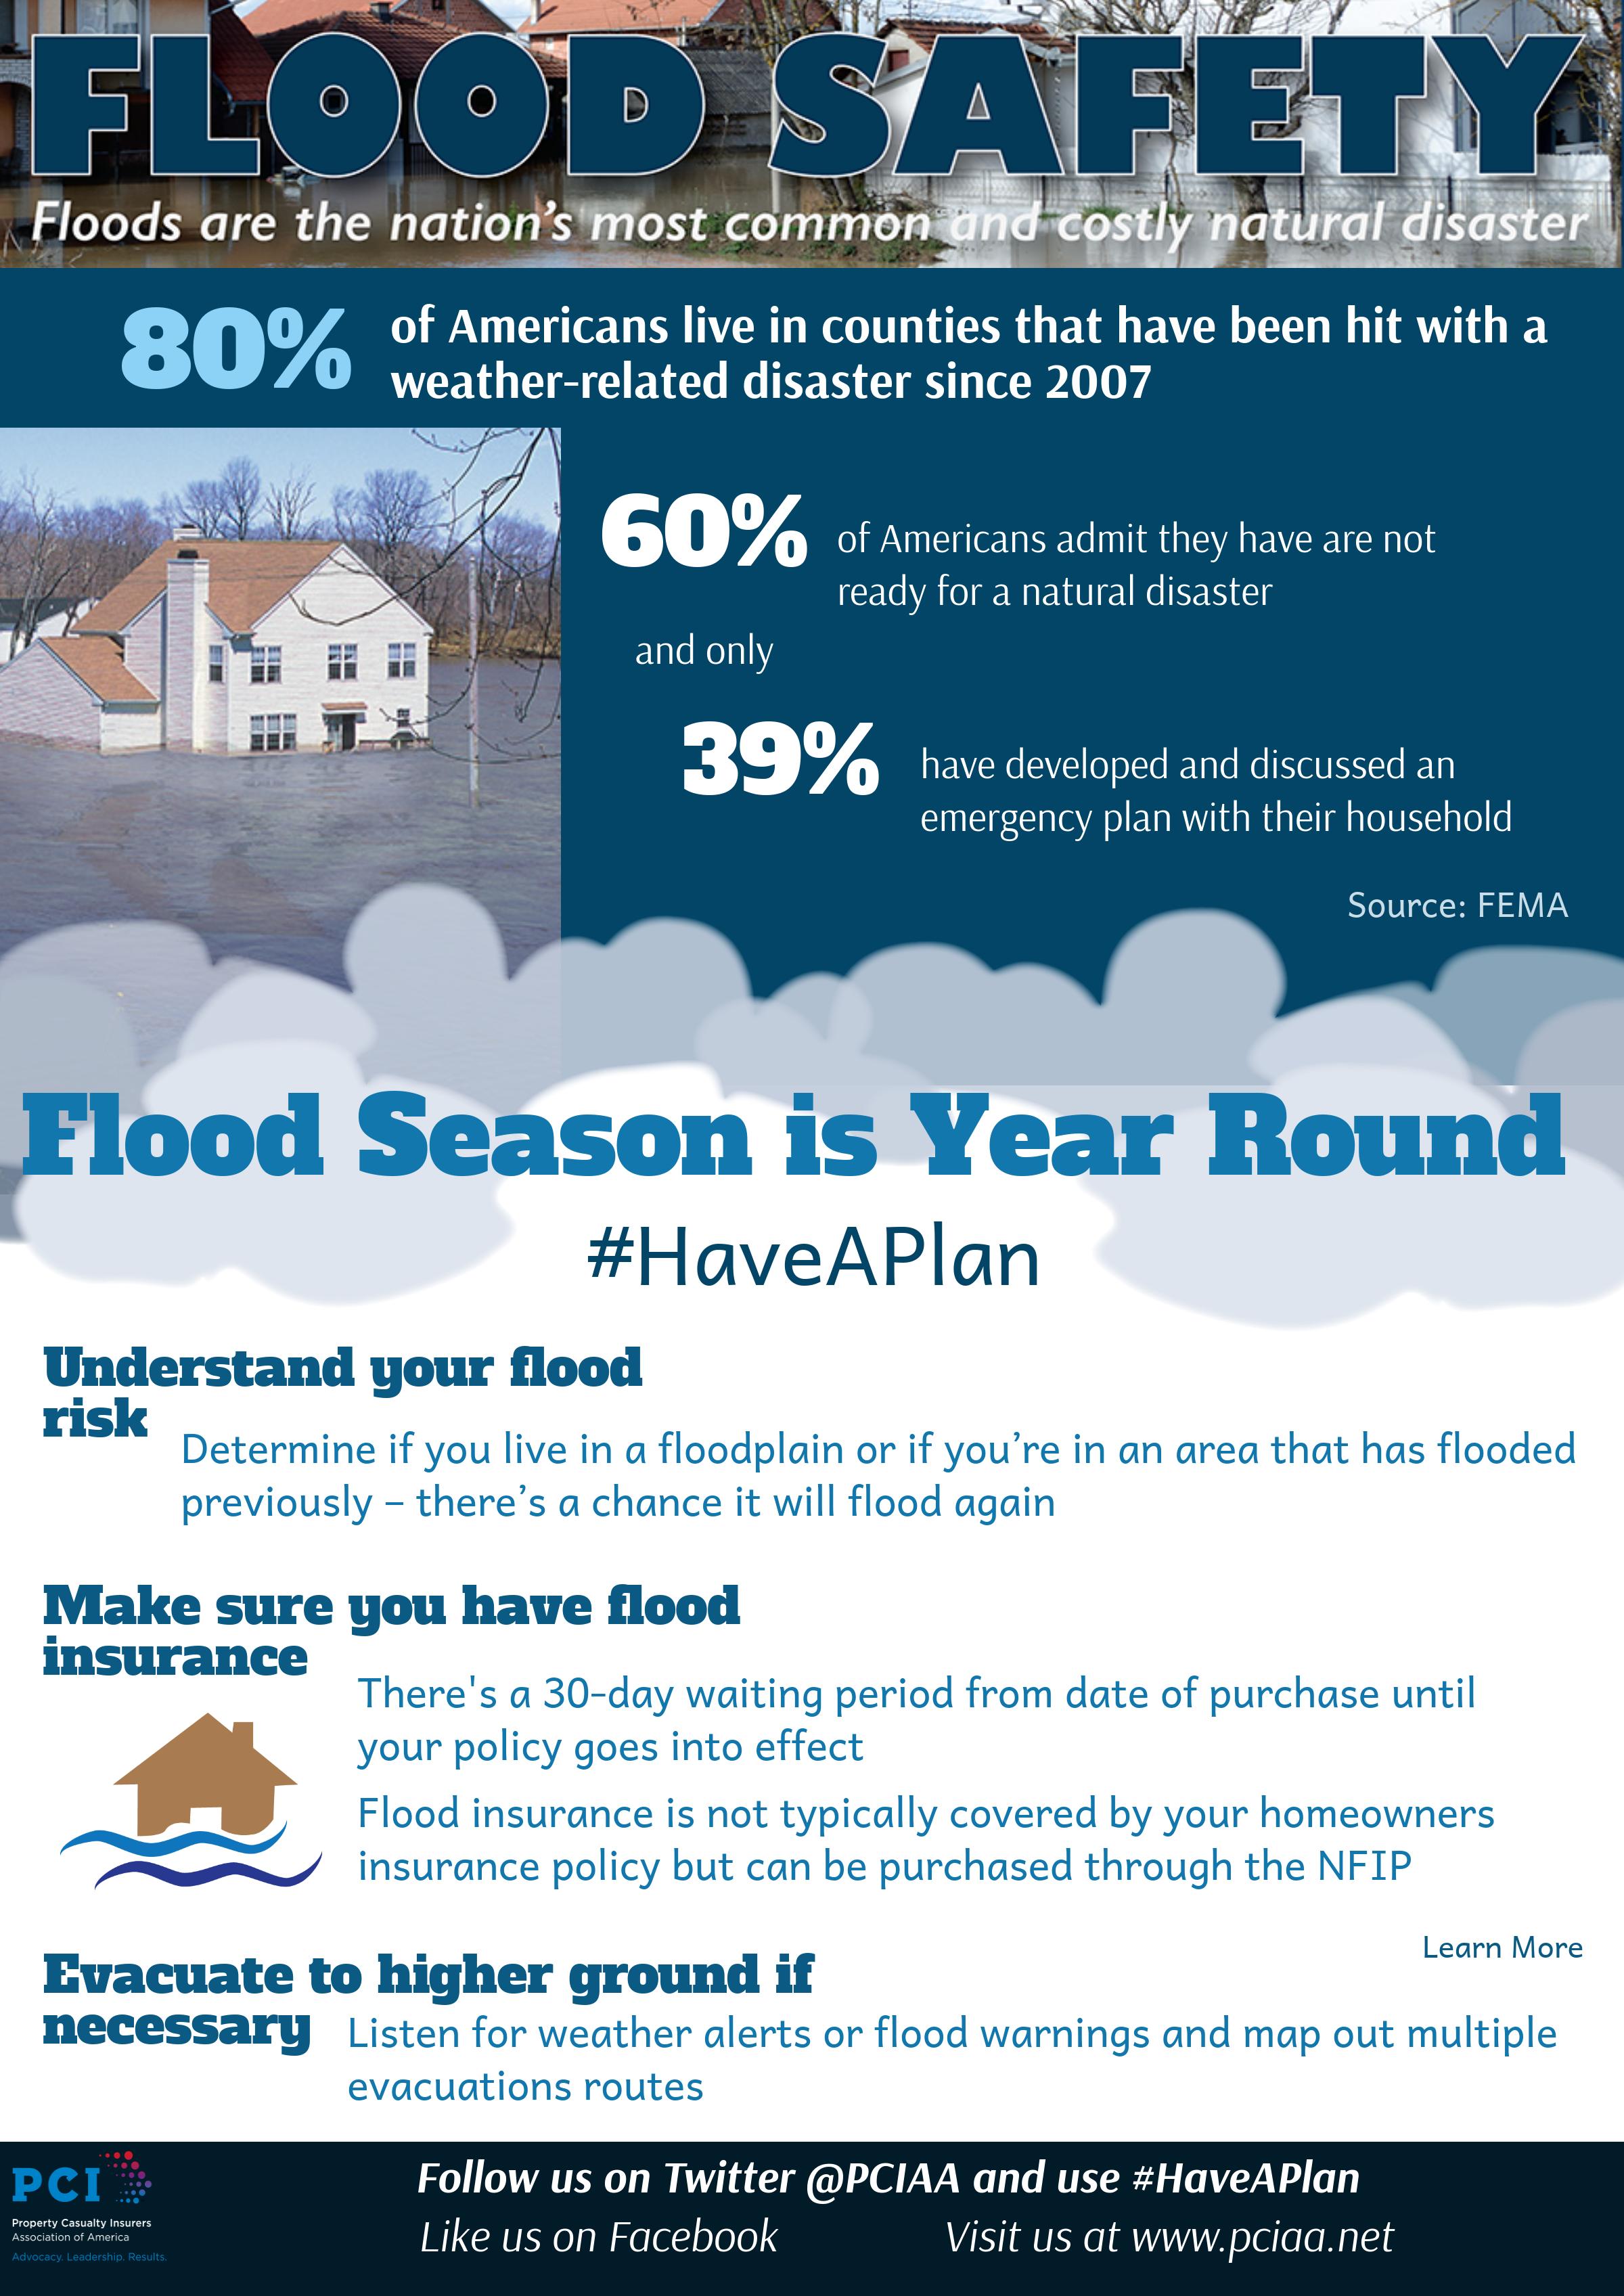 flood preparedness 2018 property casualty insurers association of